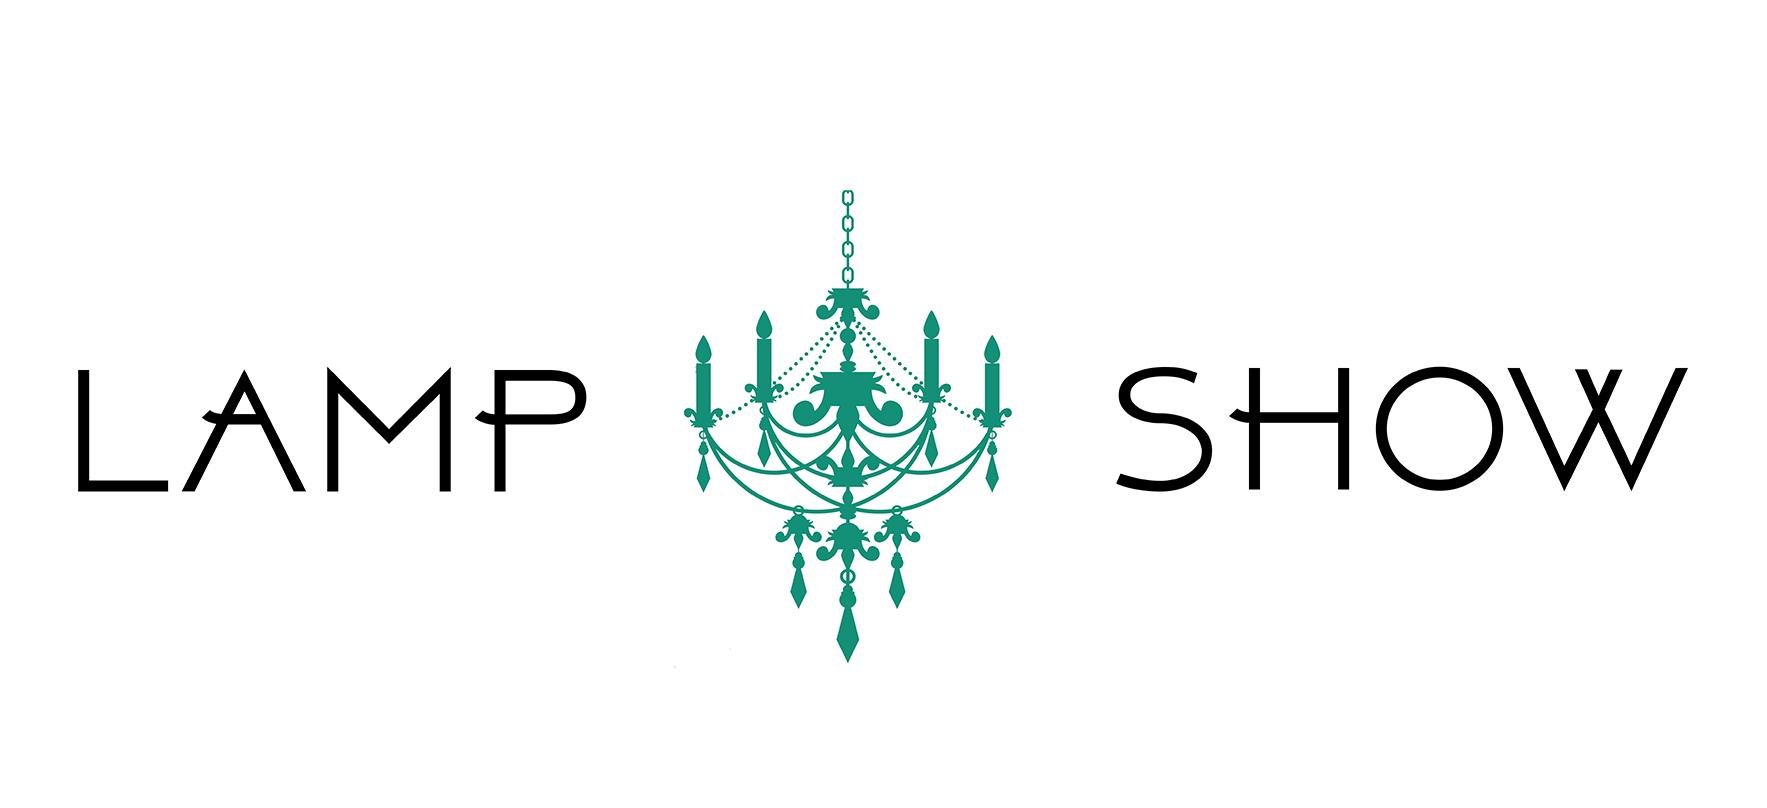 Lamp Show